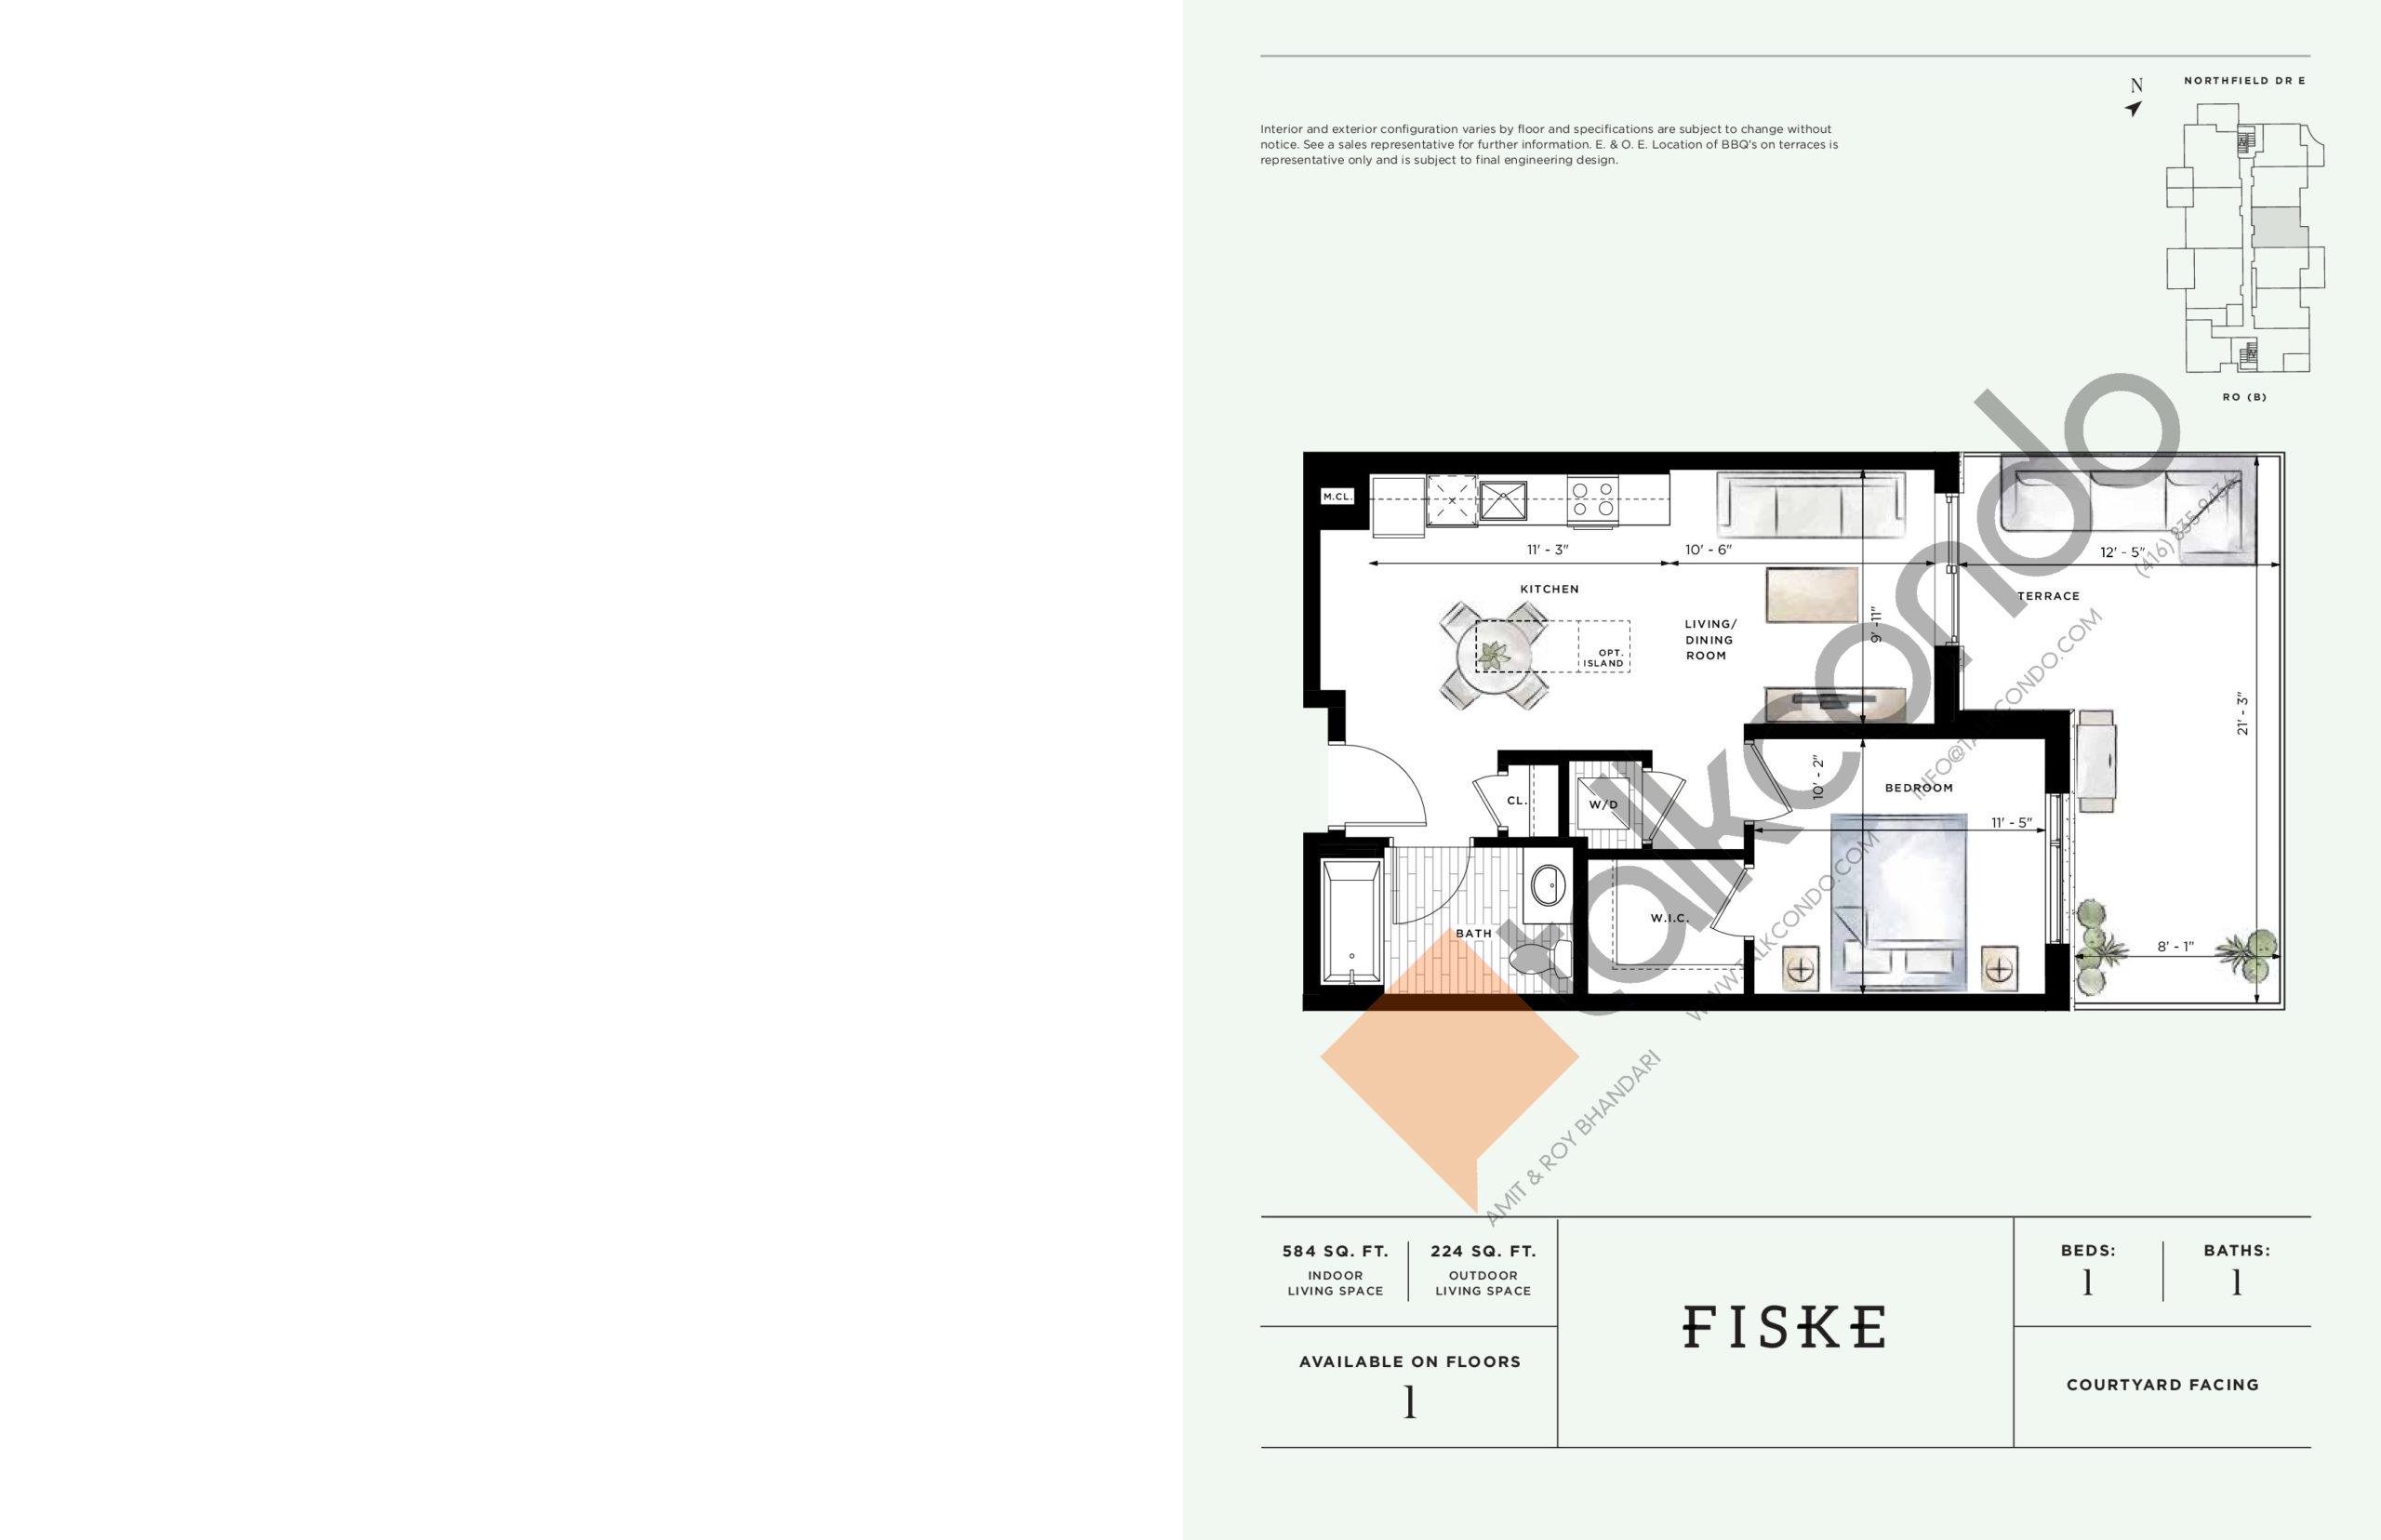 Fiske Floor Plan at Ro at Blackstone Condos - 584 sq.ft